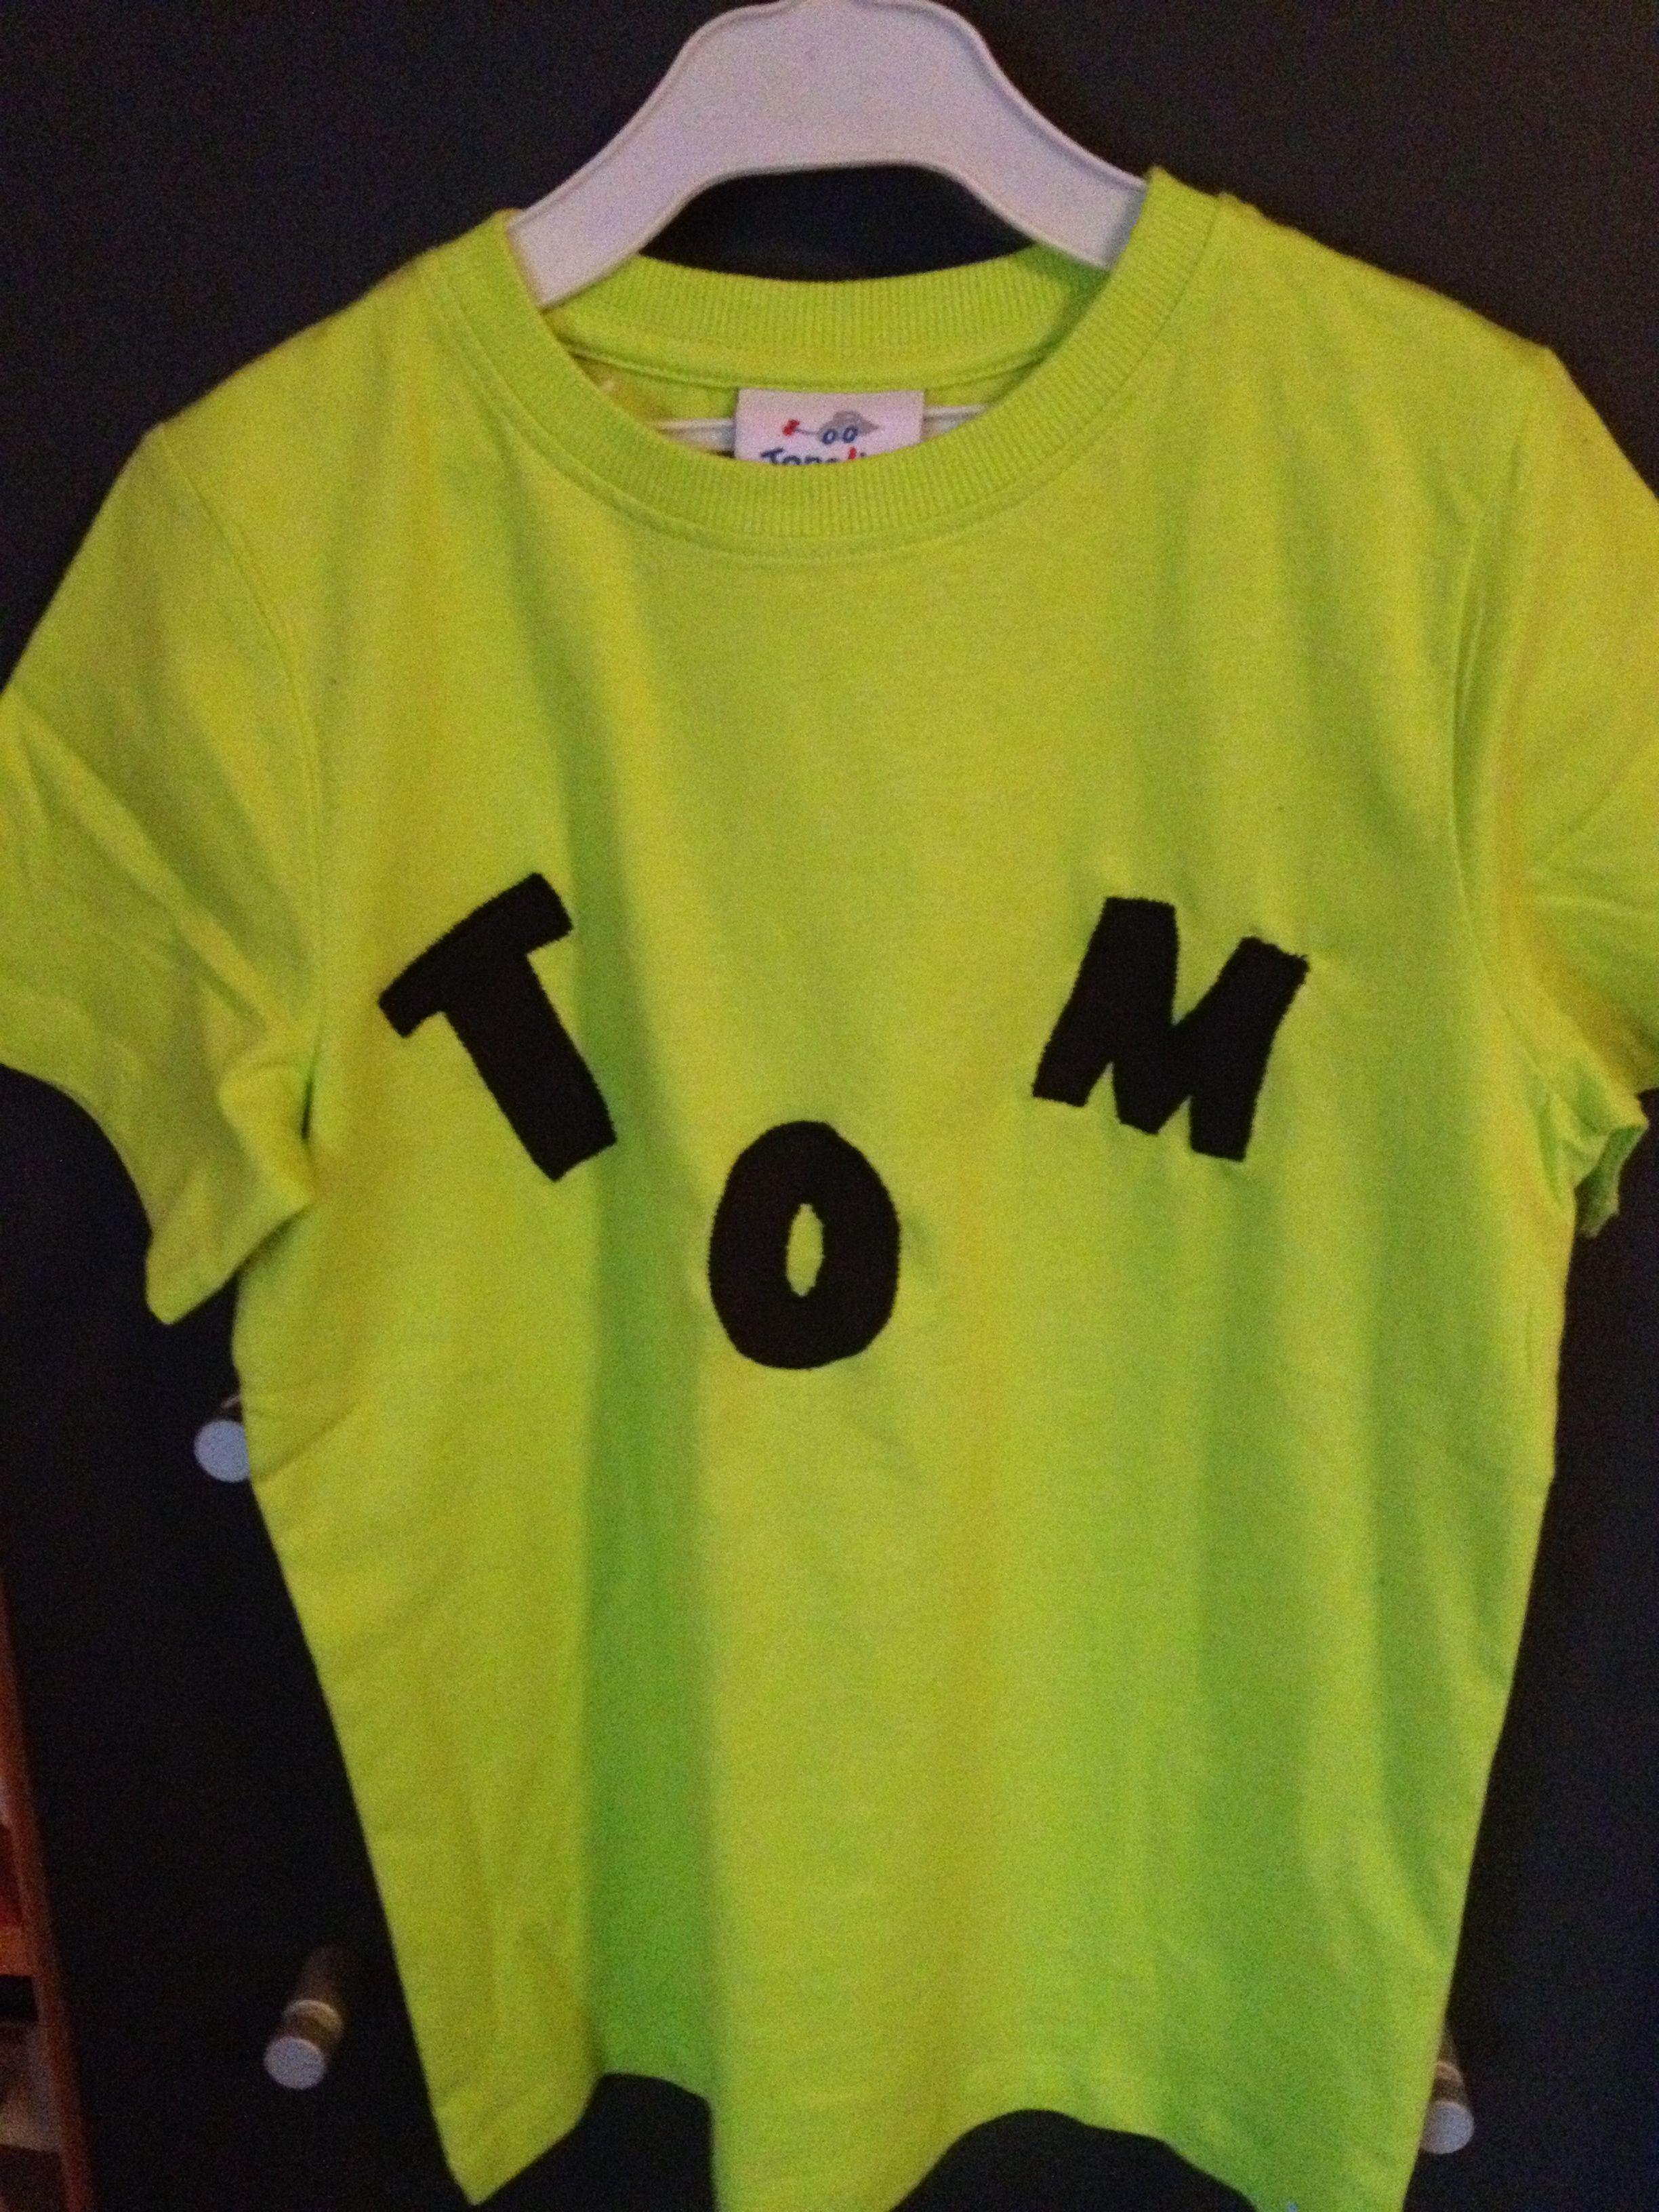 Namens-Shirt